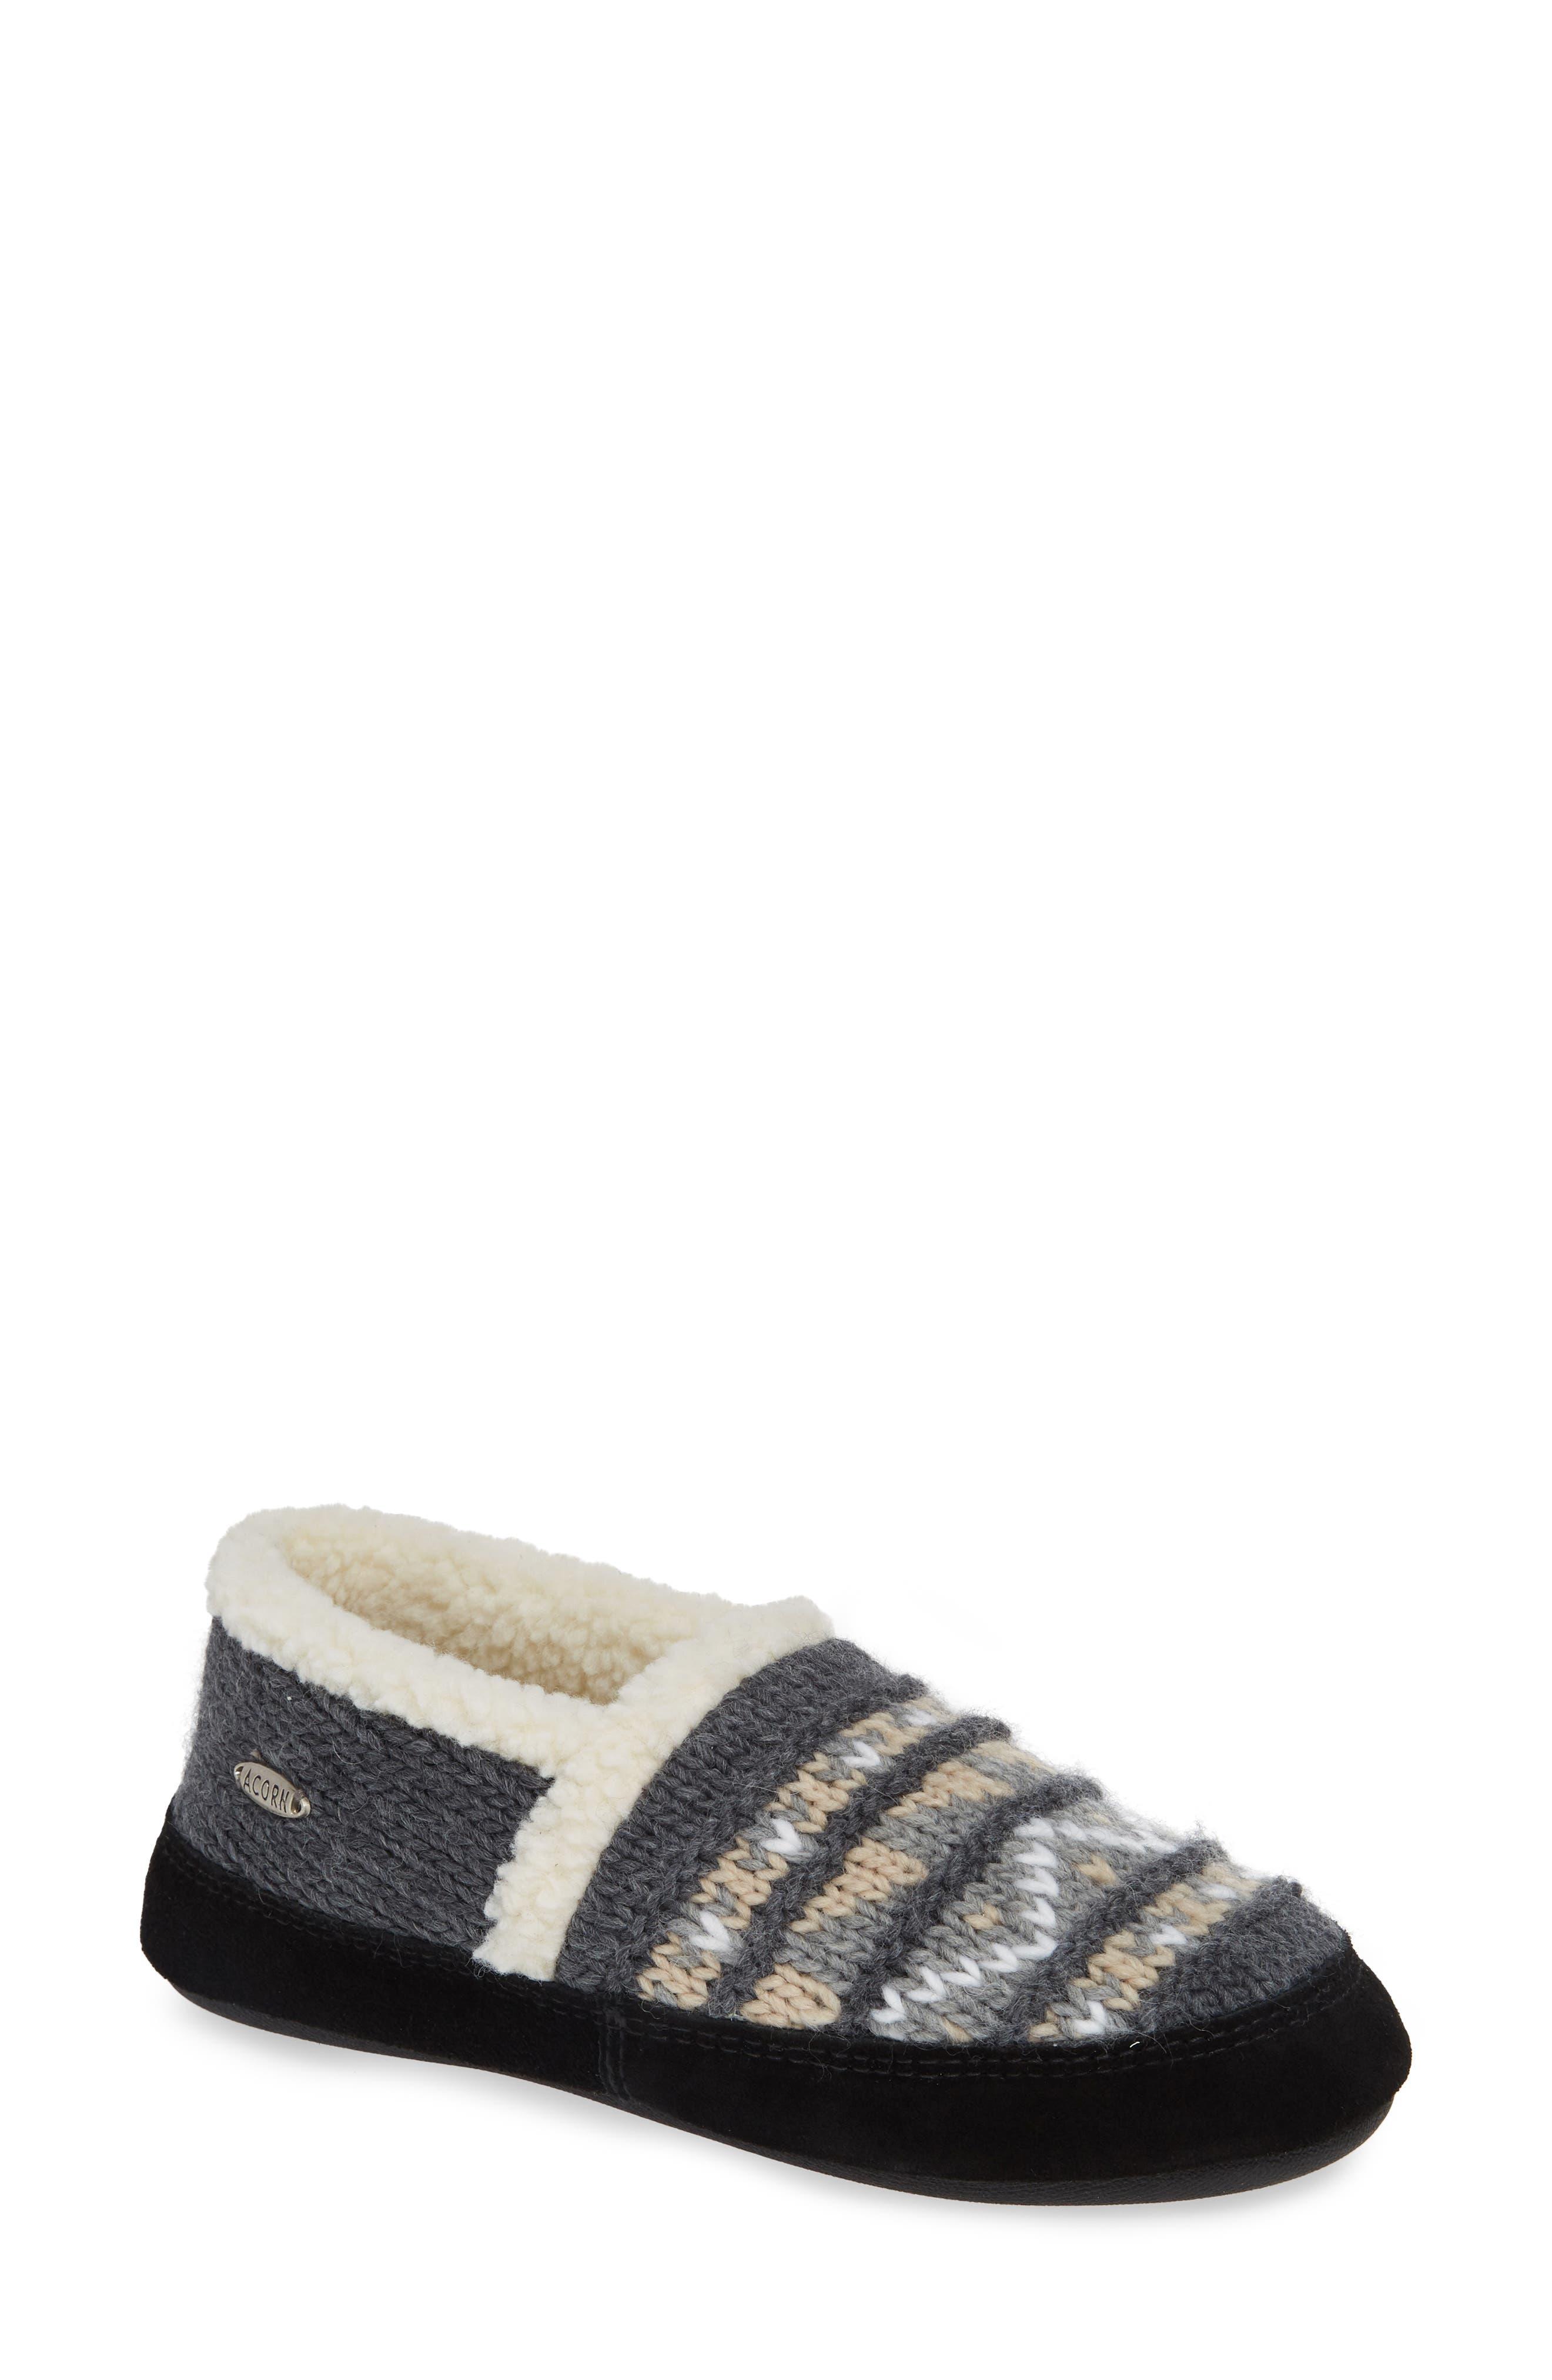 ACORN Nordic Moc Slipper, Main, color, NORDIC GREY FABRIC